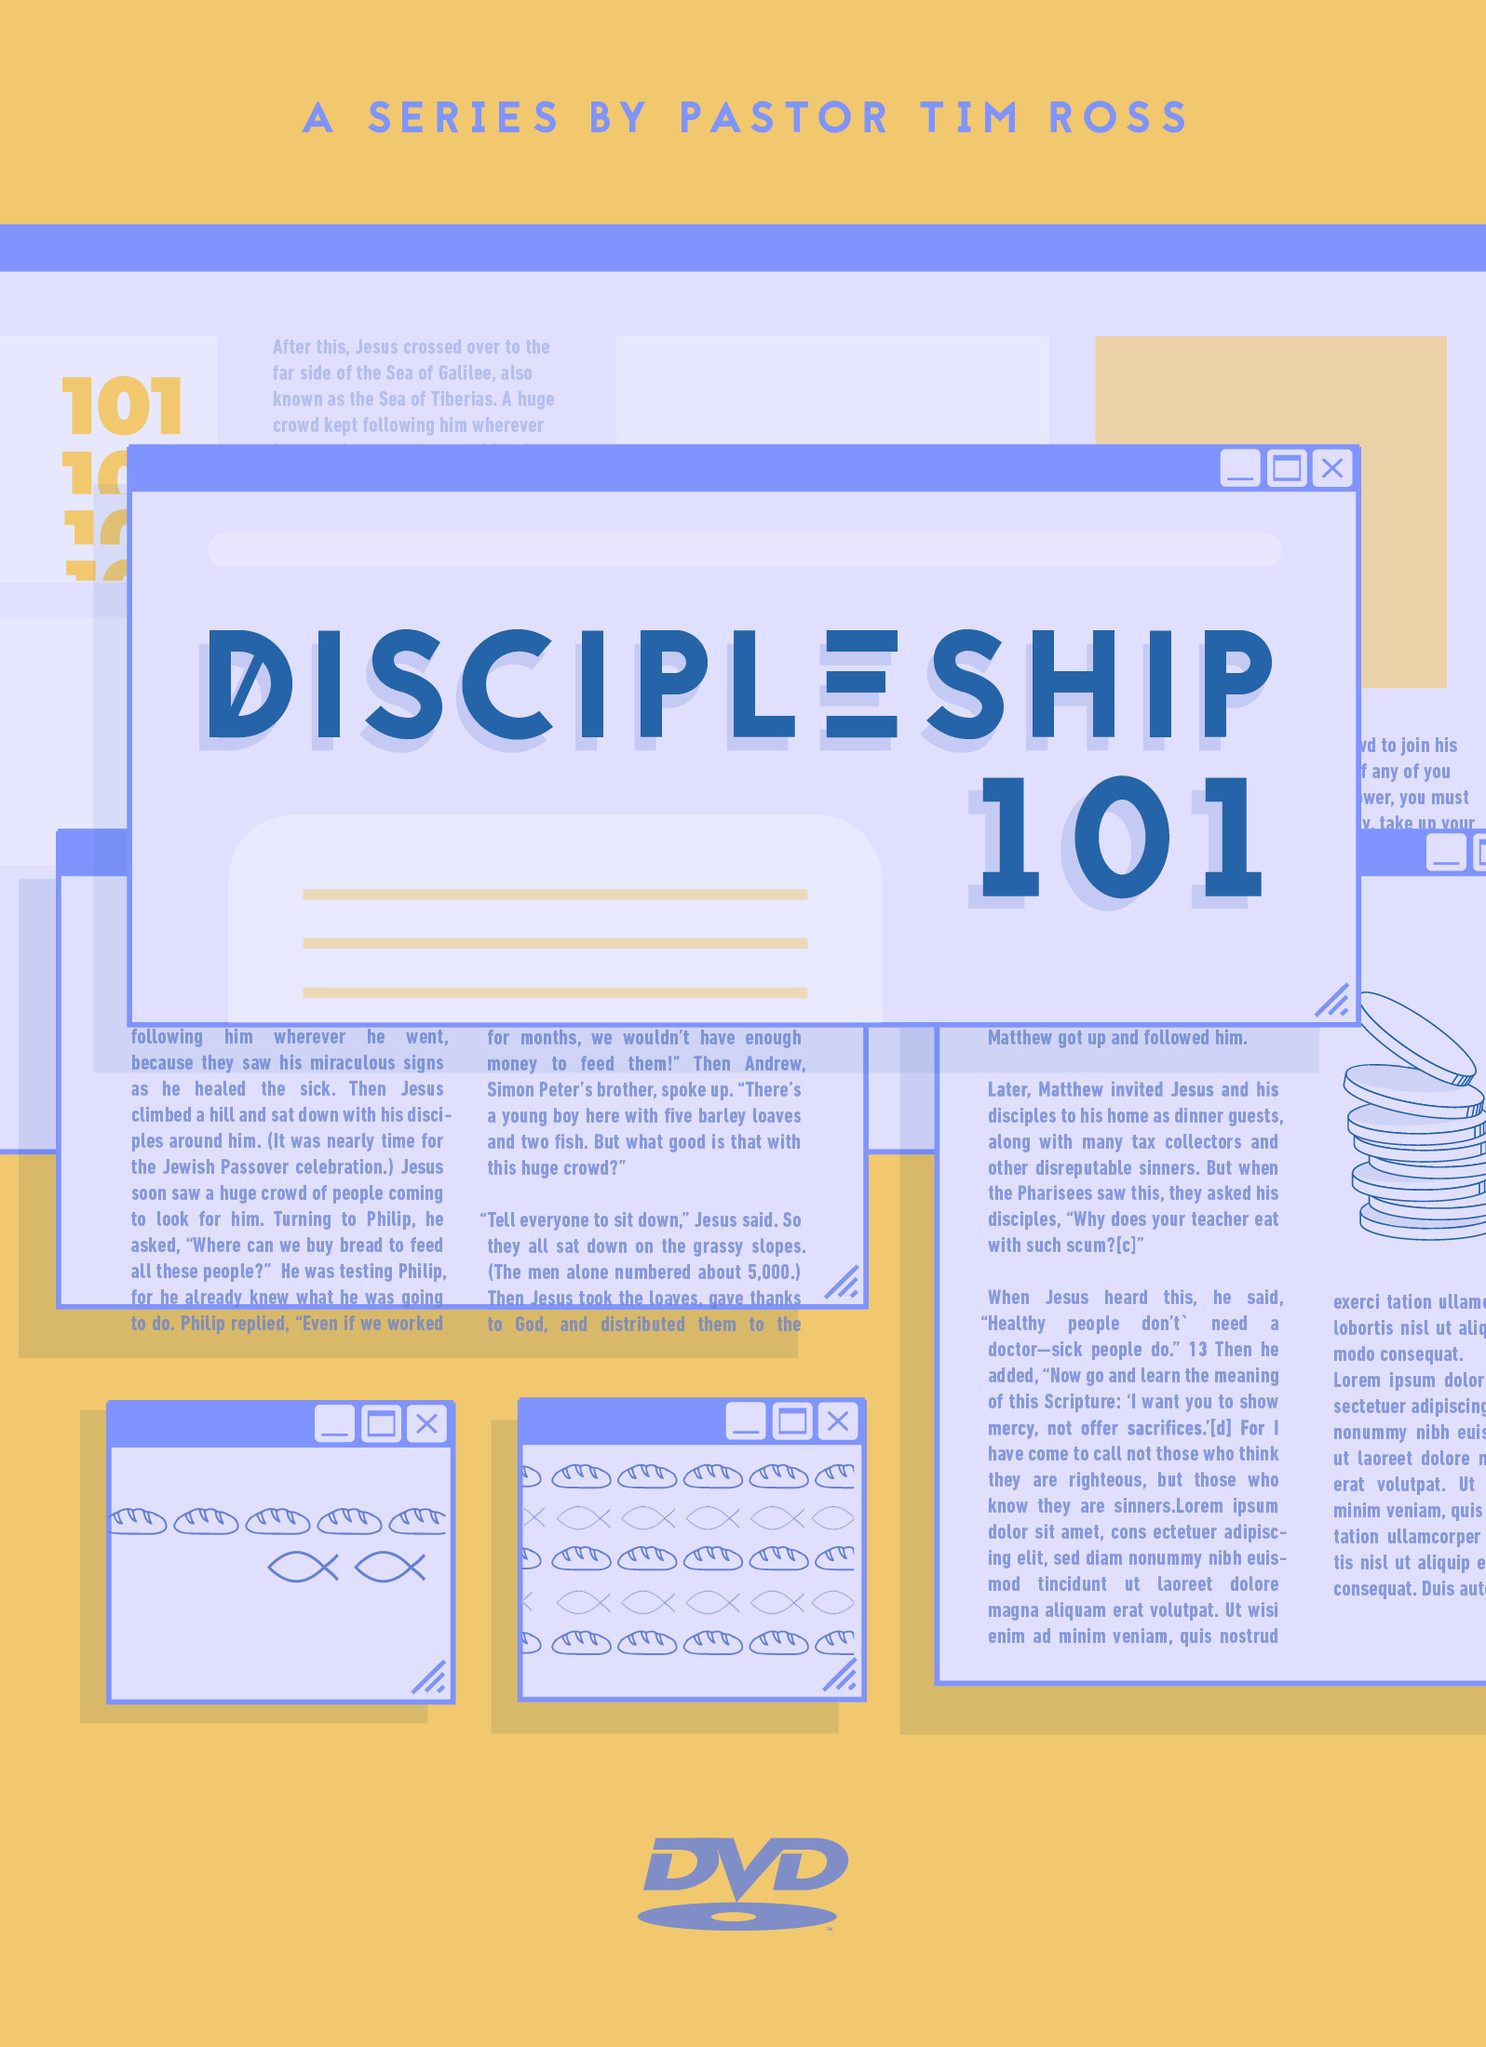 Discipleship 101 Series DVD